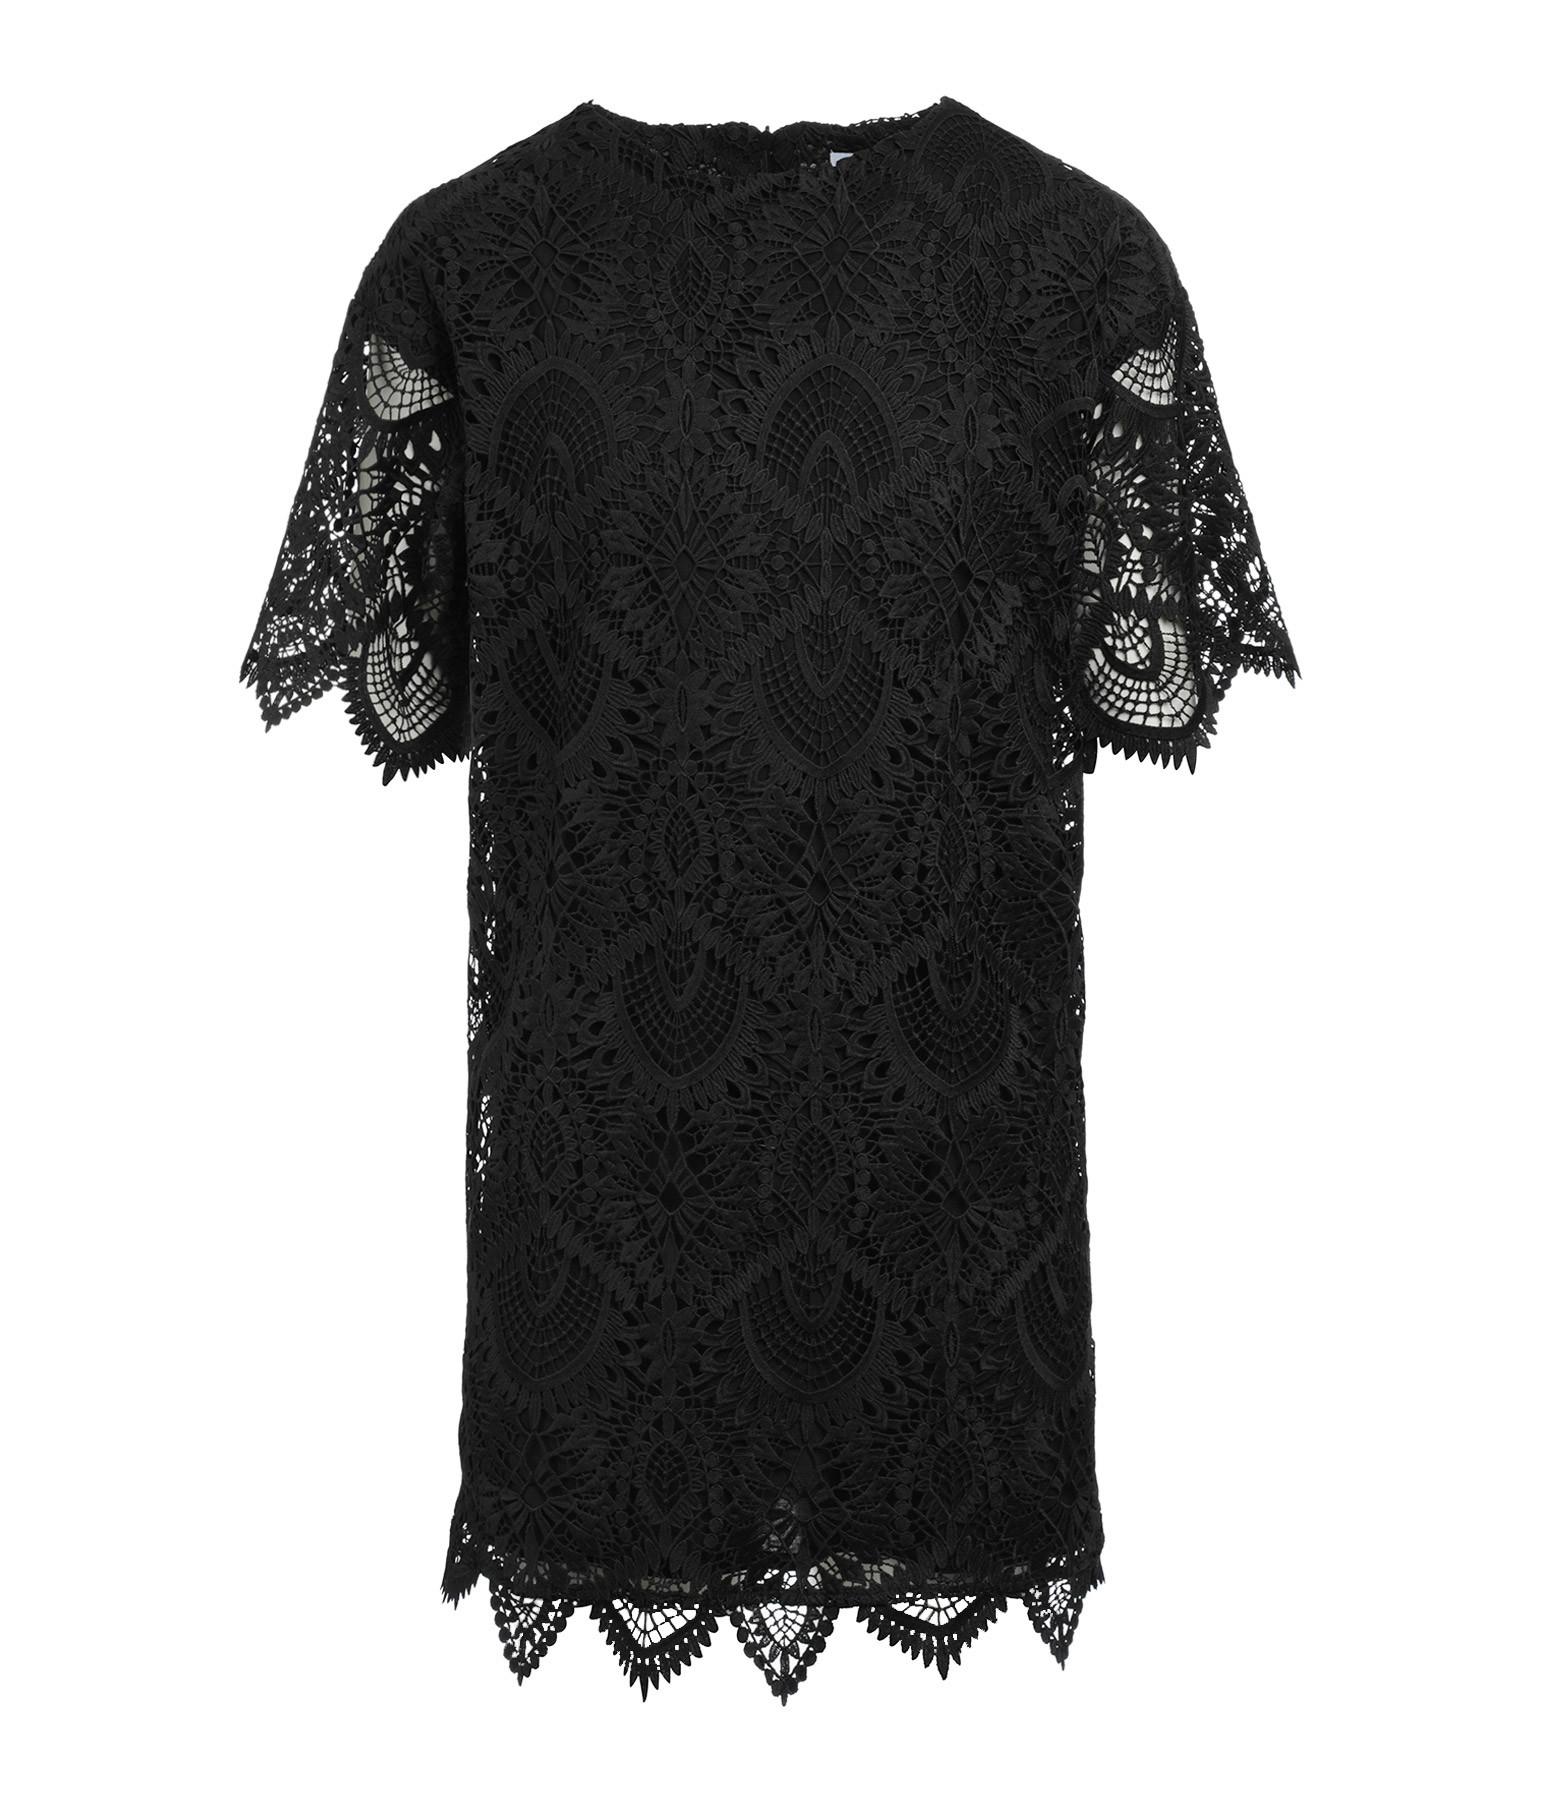 MODETROTTER - Robe Oscar Imprimé Tolki Noir